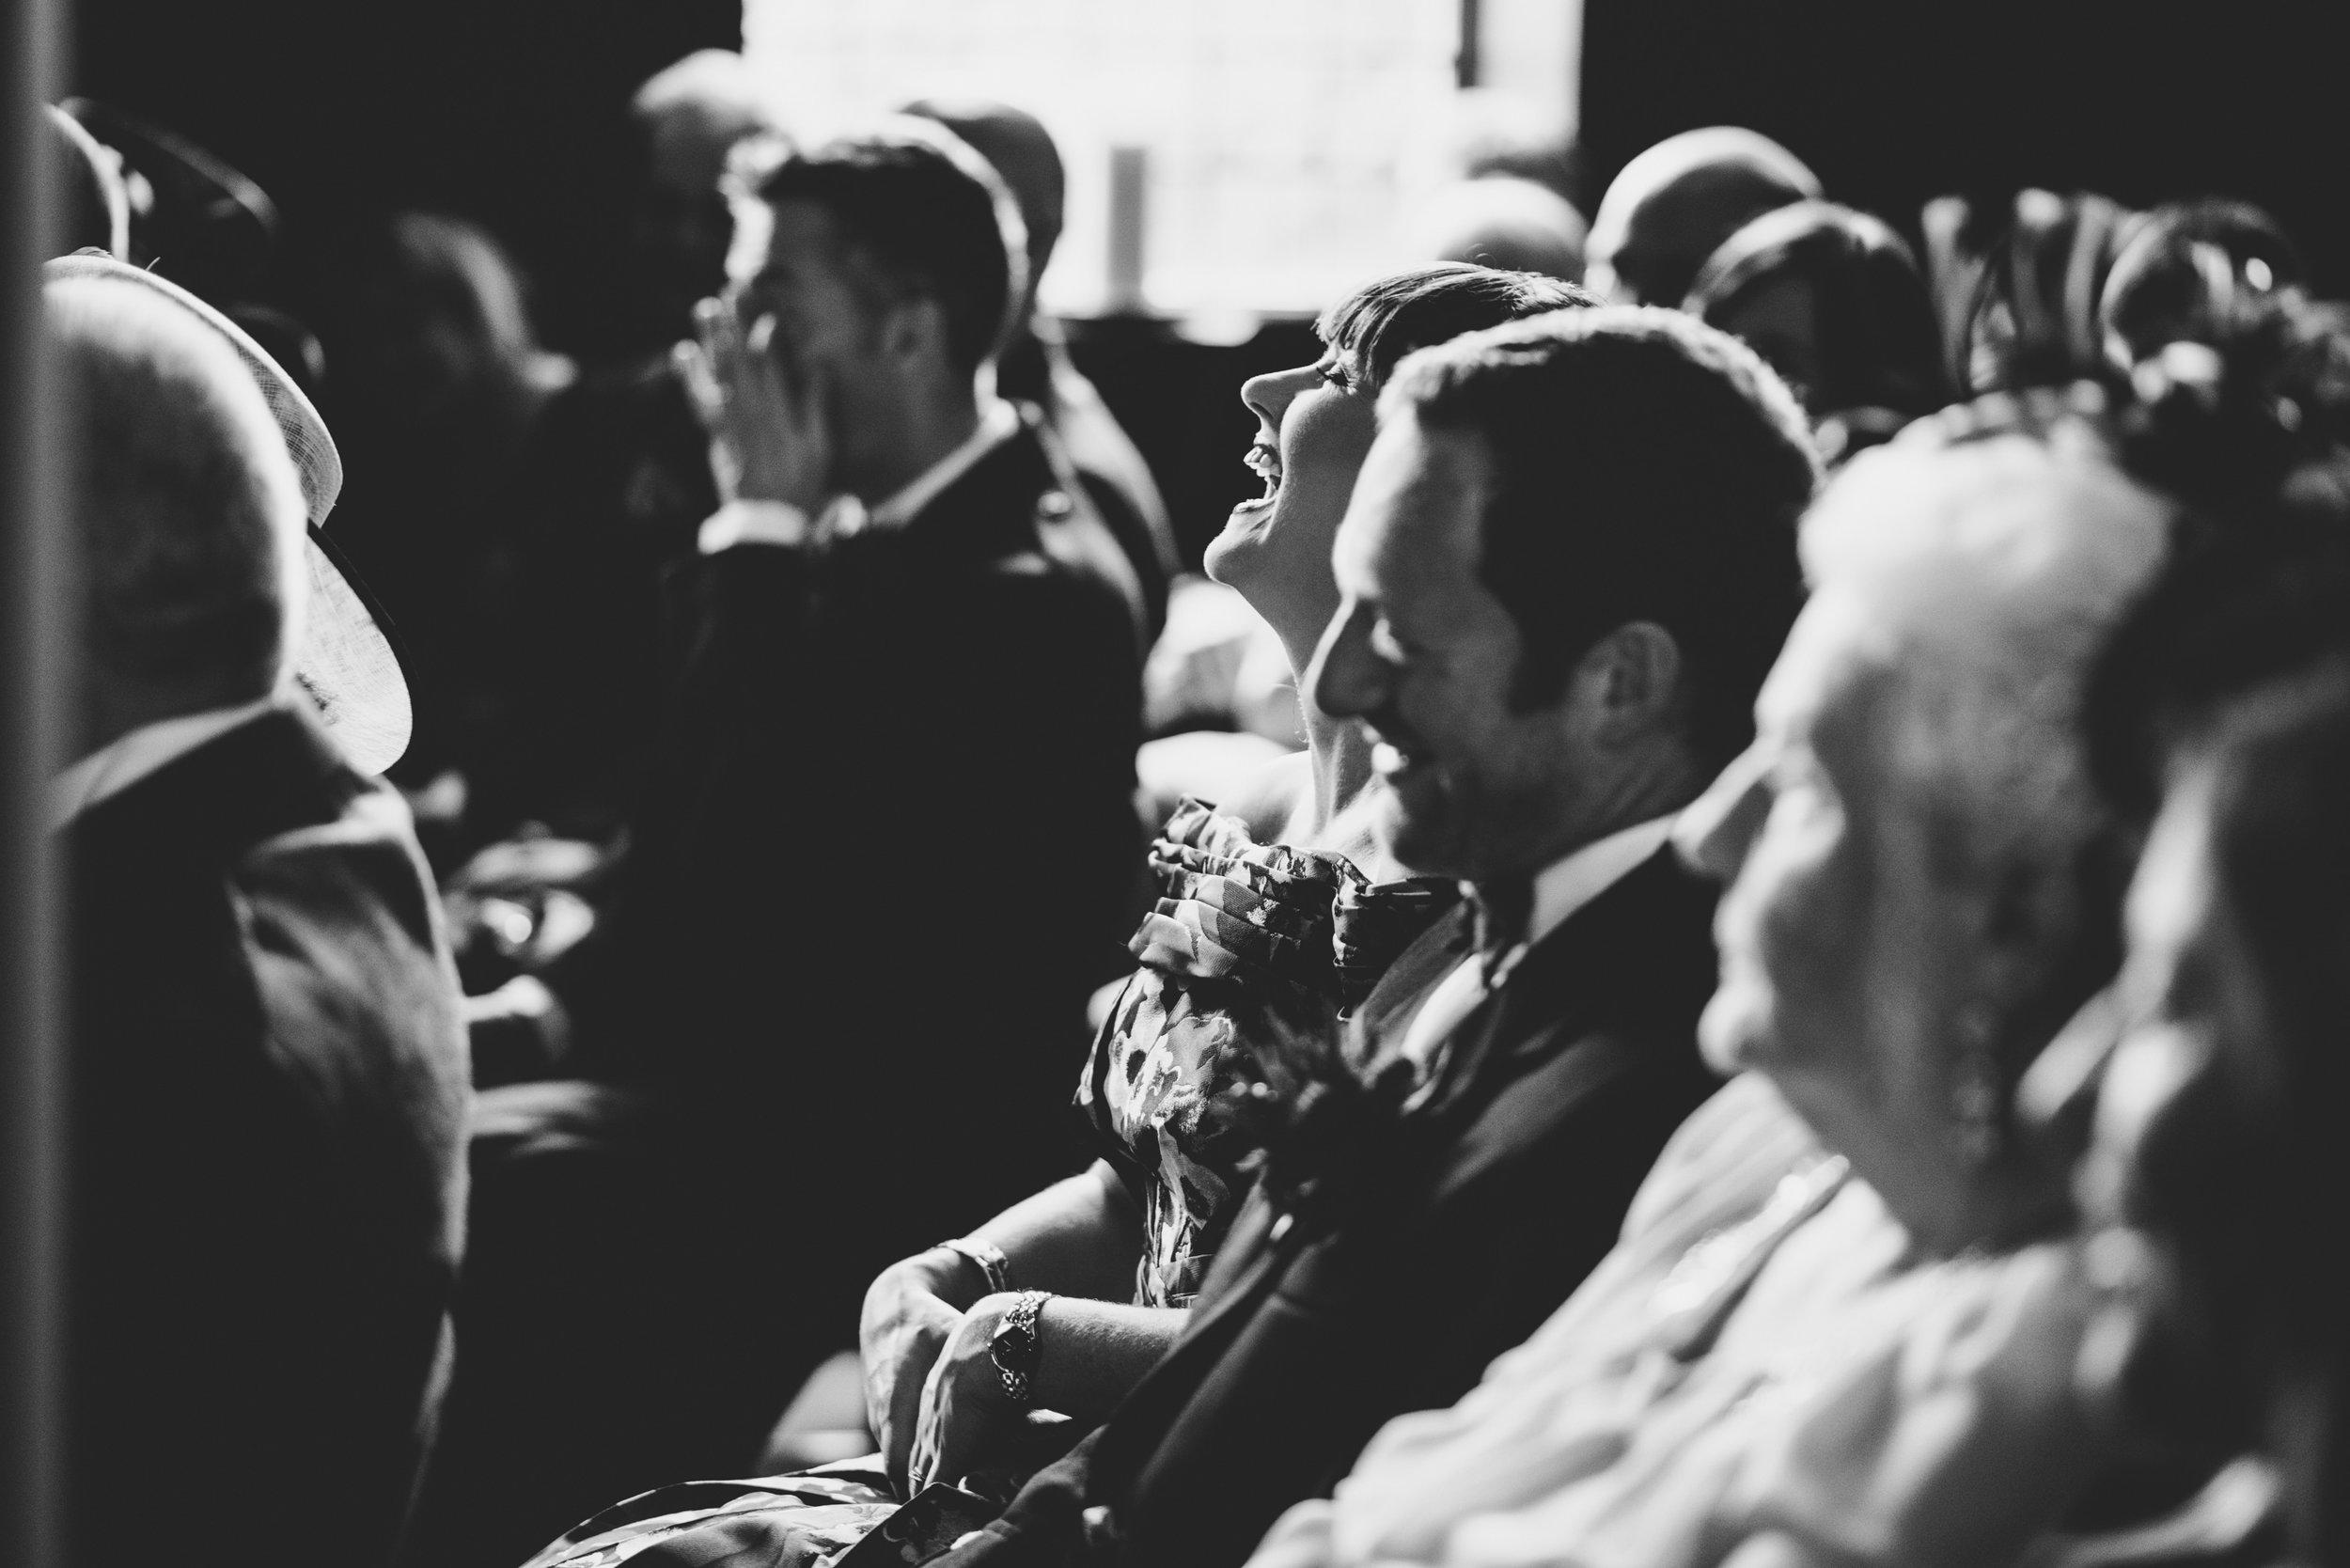 0167-LISA-DEVINE-PHOTOGRAPHY-ALTERNATIVE-WEDDING-PHOTOGRAPHY-SCOTLAND-DESTINATION-WEDDINGS-GLASGOW-WEDDINGS-COOL-WEDDINGS-STYLISH-WEDDINGS.JPG